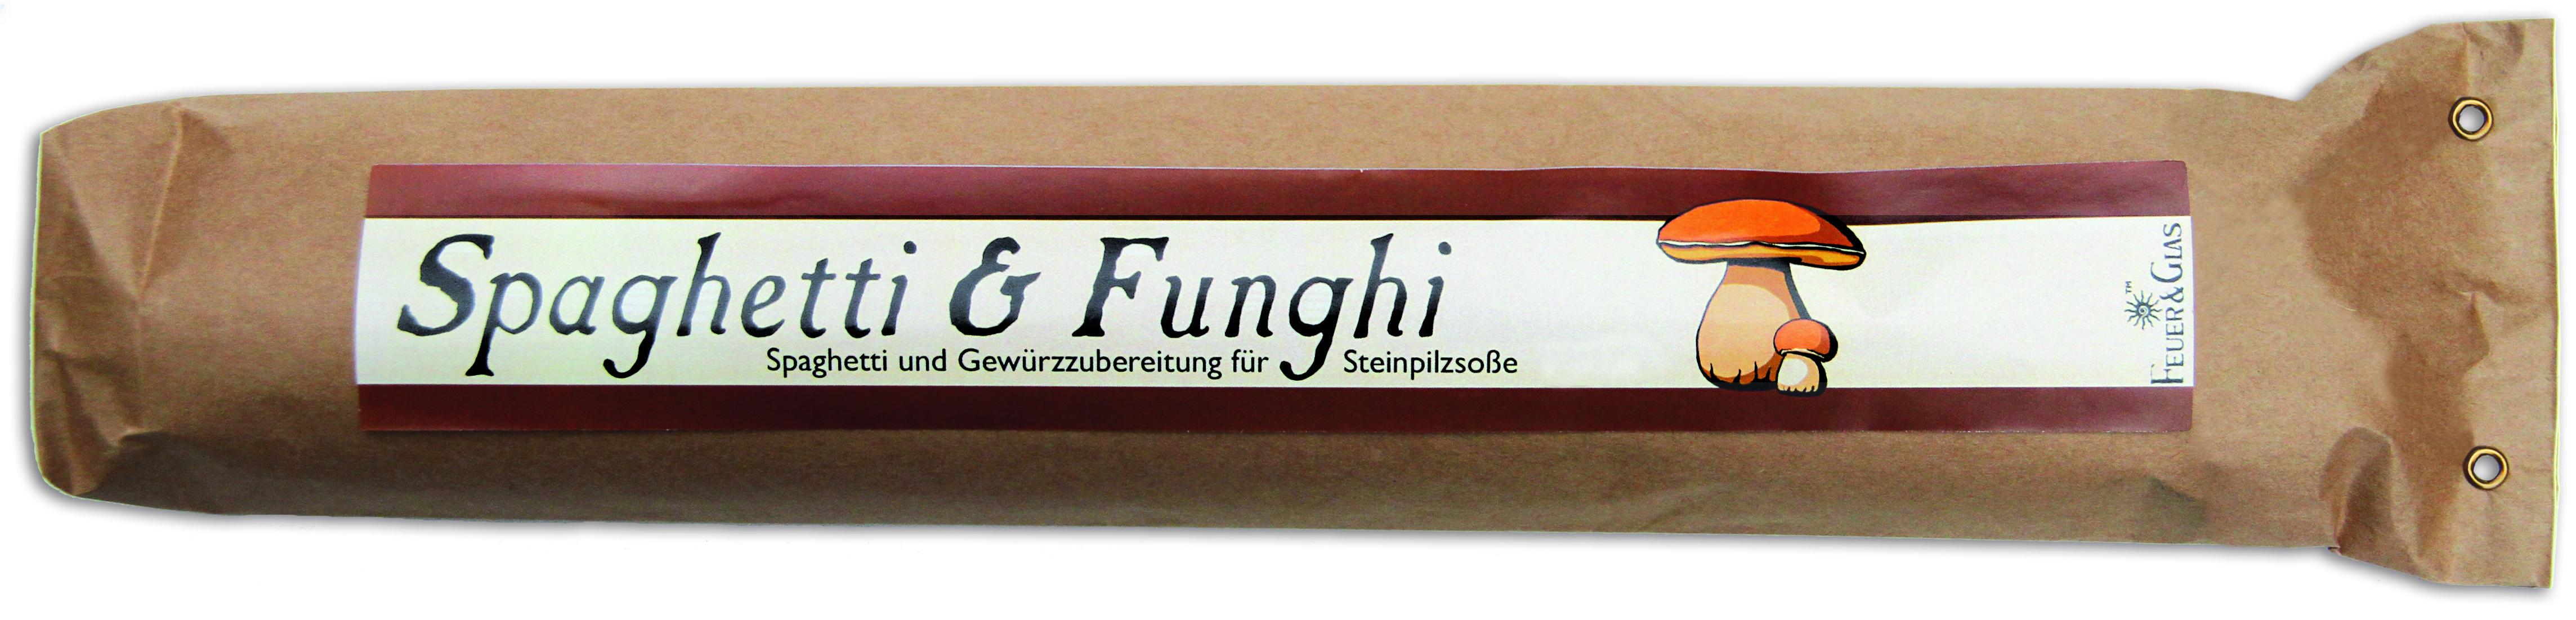 Spaghetti & Funghi